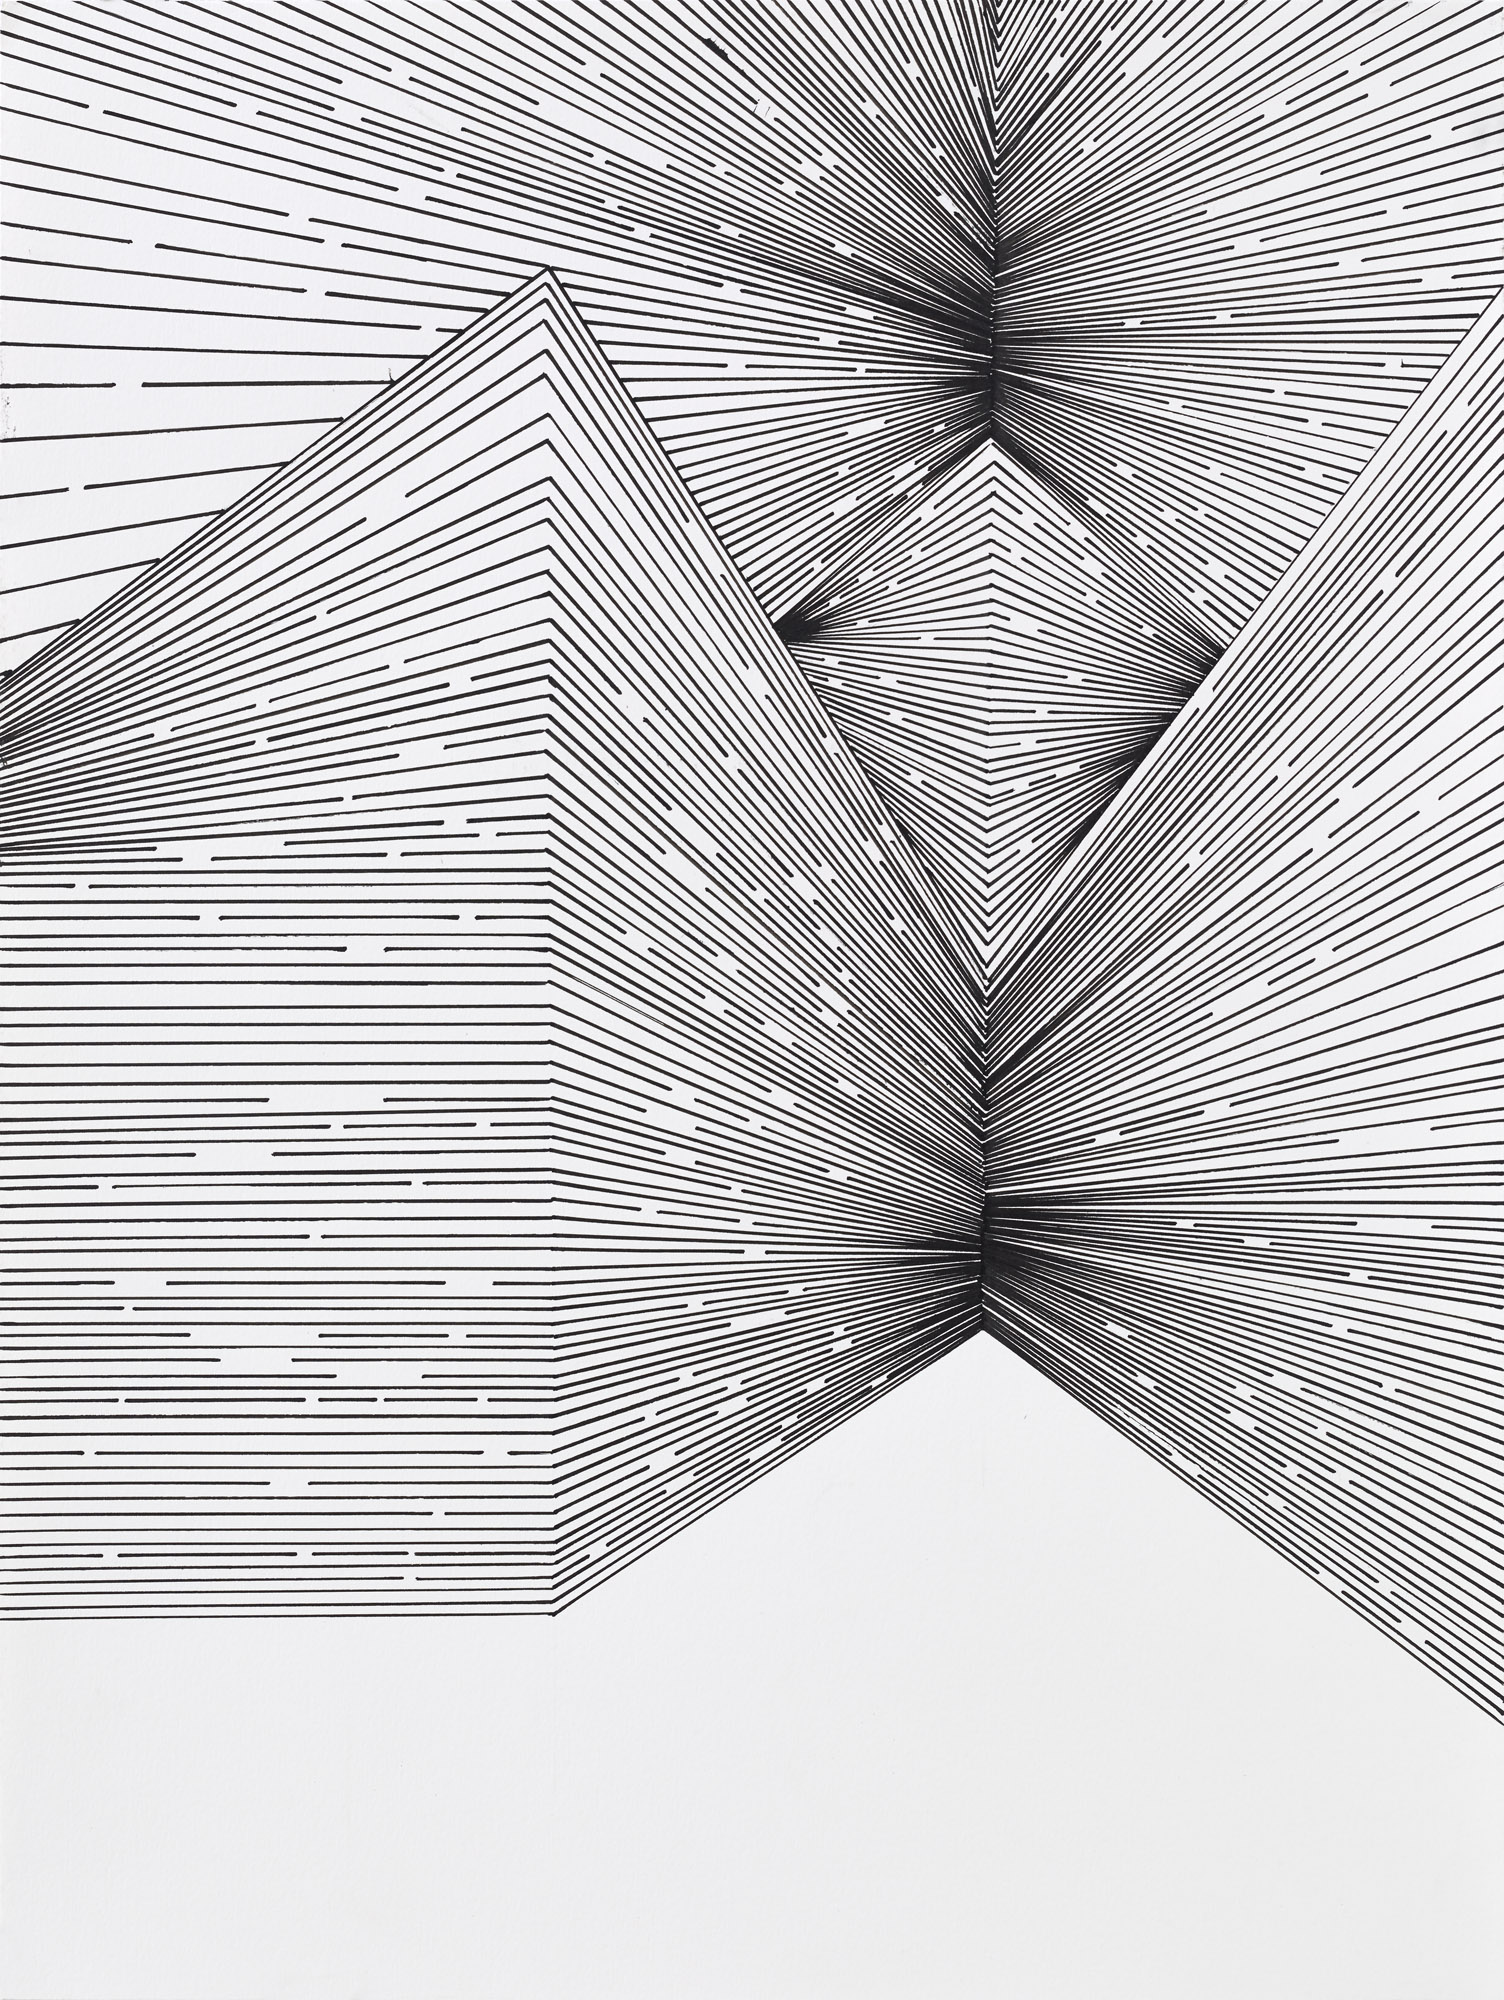 BK P 7513 | untitled acrylic on paper | 40x30cm | 2015 | collection ritz carlton berlin